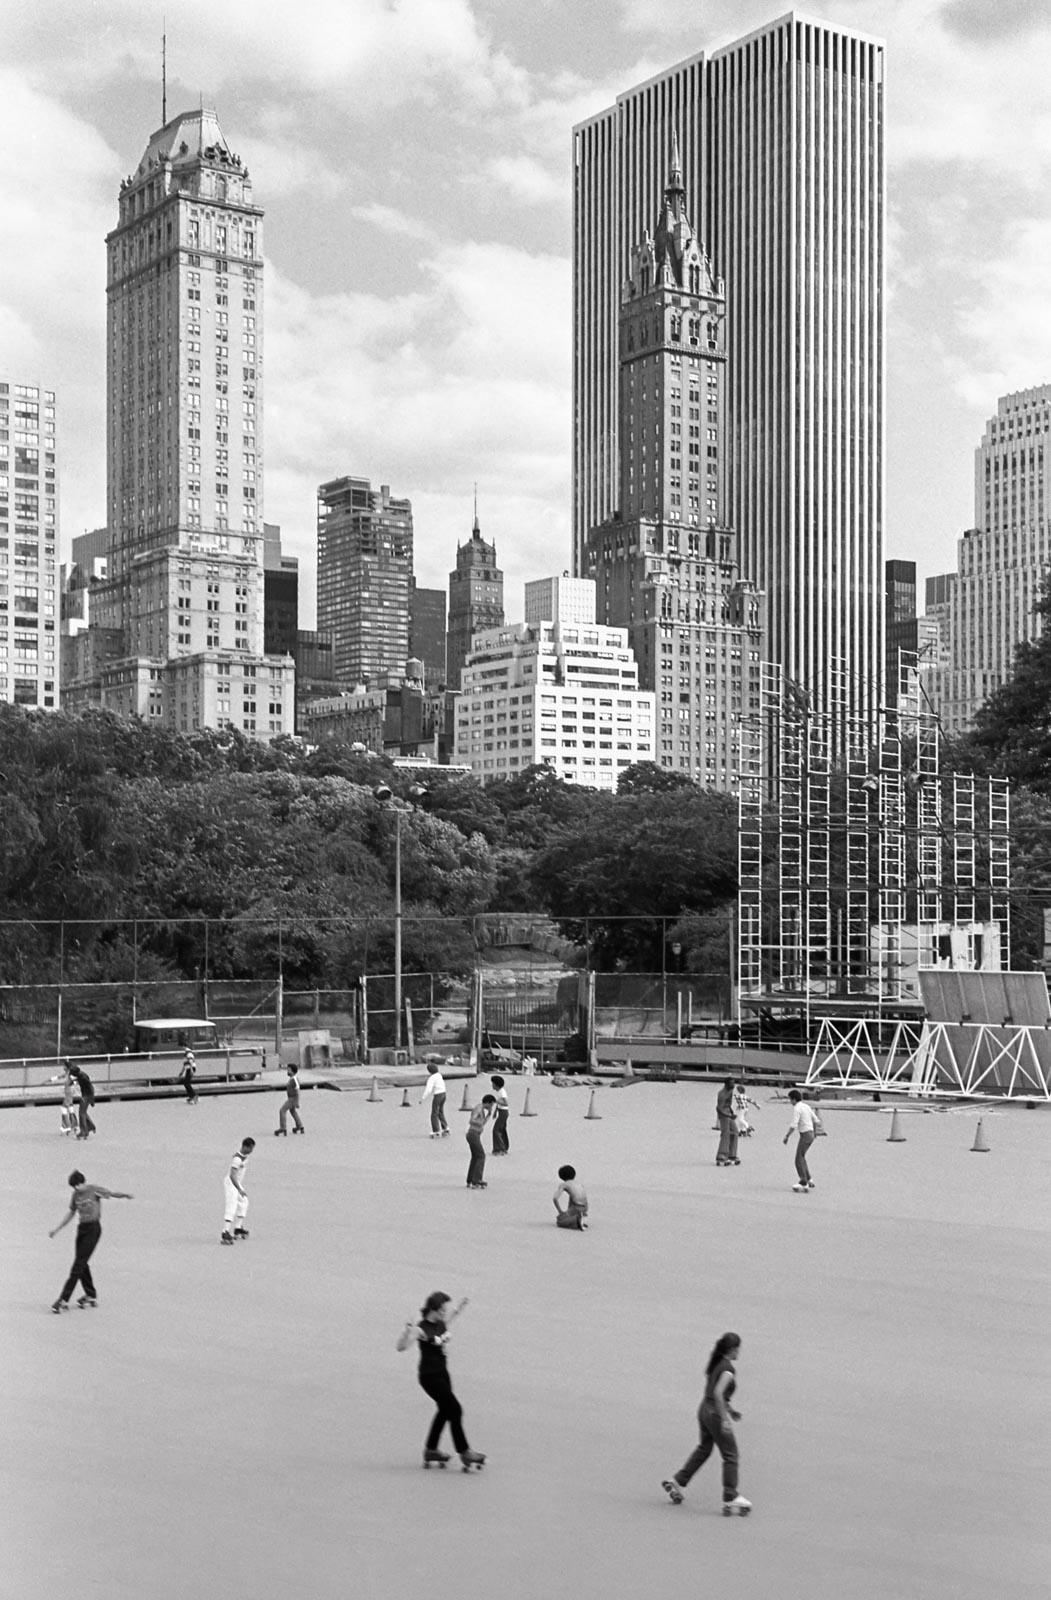 Central park, New York 1982